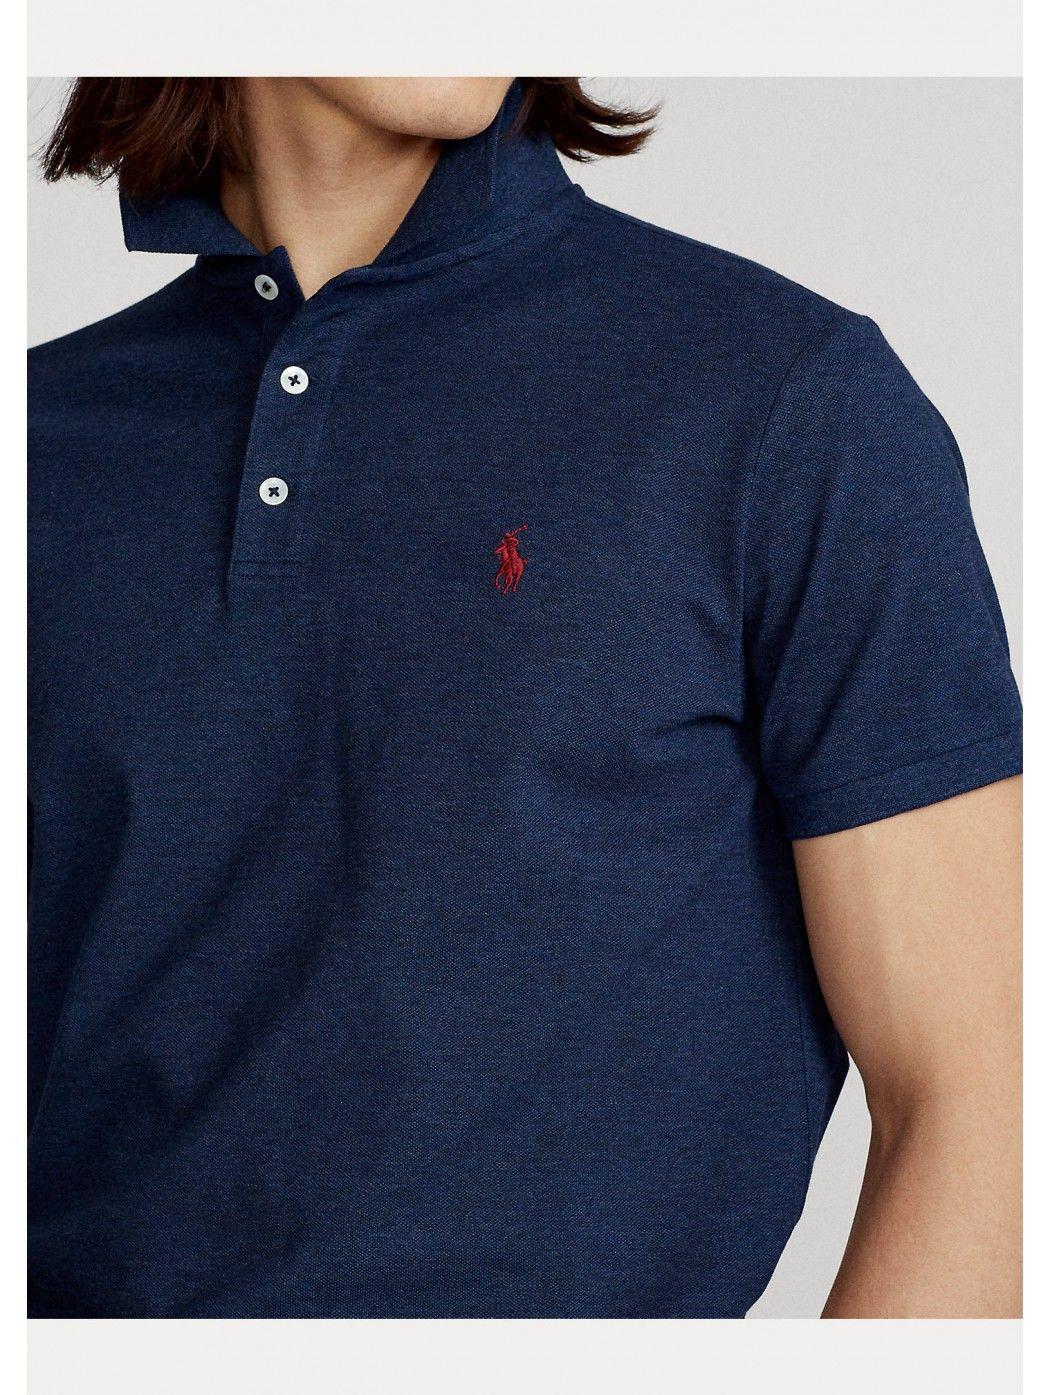 Polo in piqu' stretch Slim-Fit POLO RALPH LAUREN UOMO 710541705 150